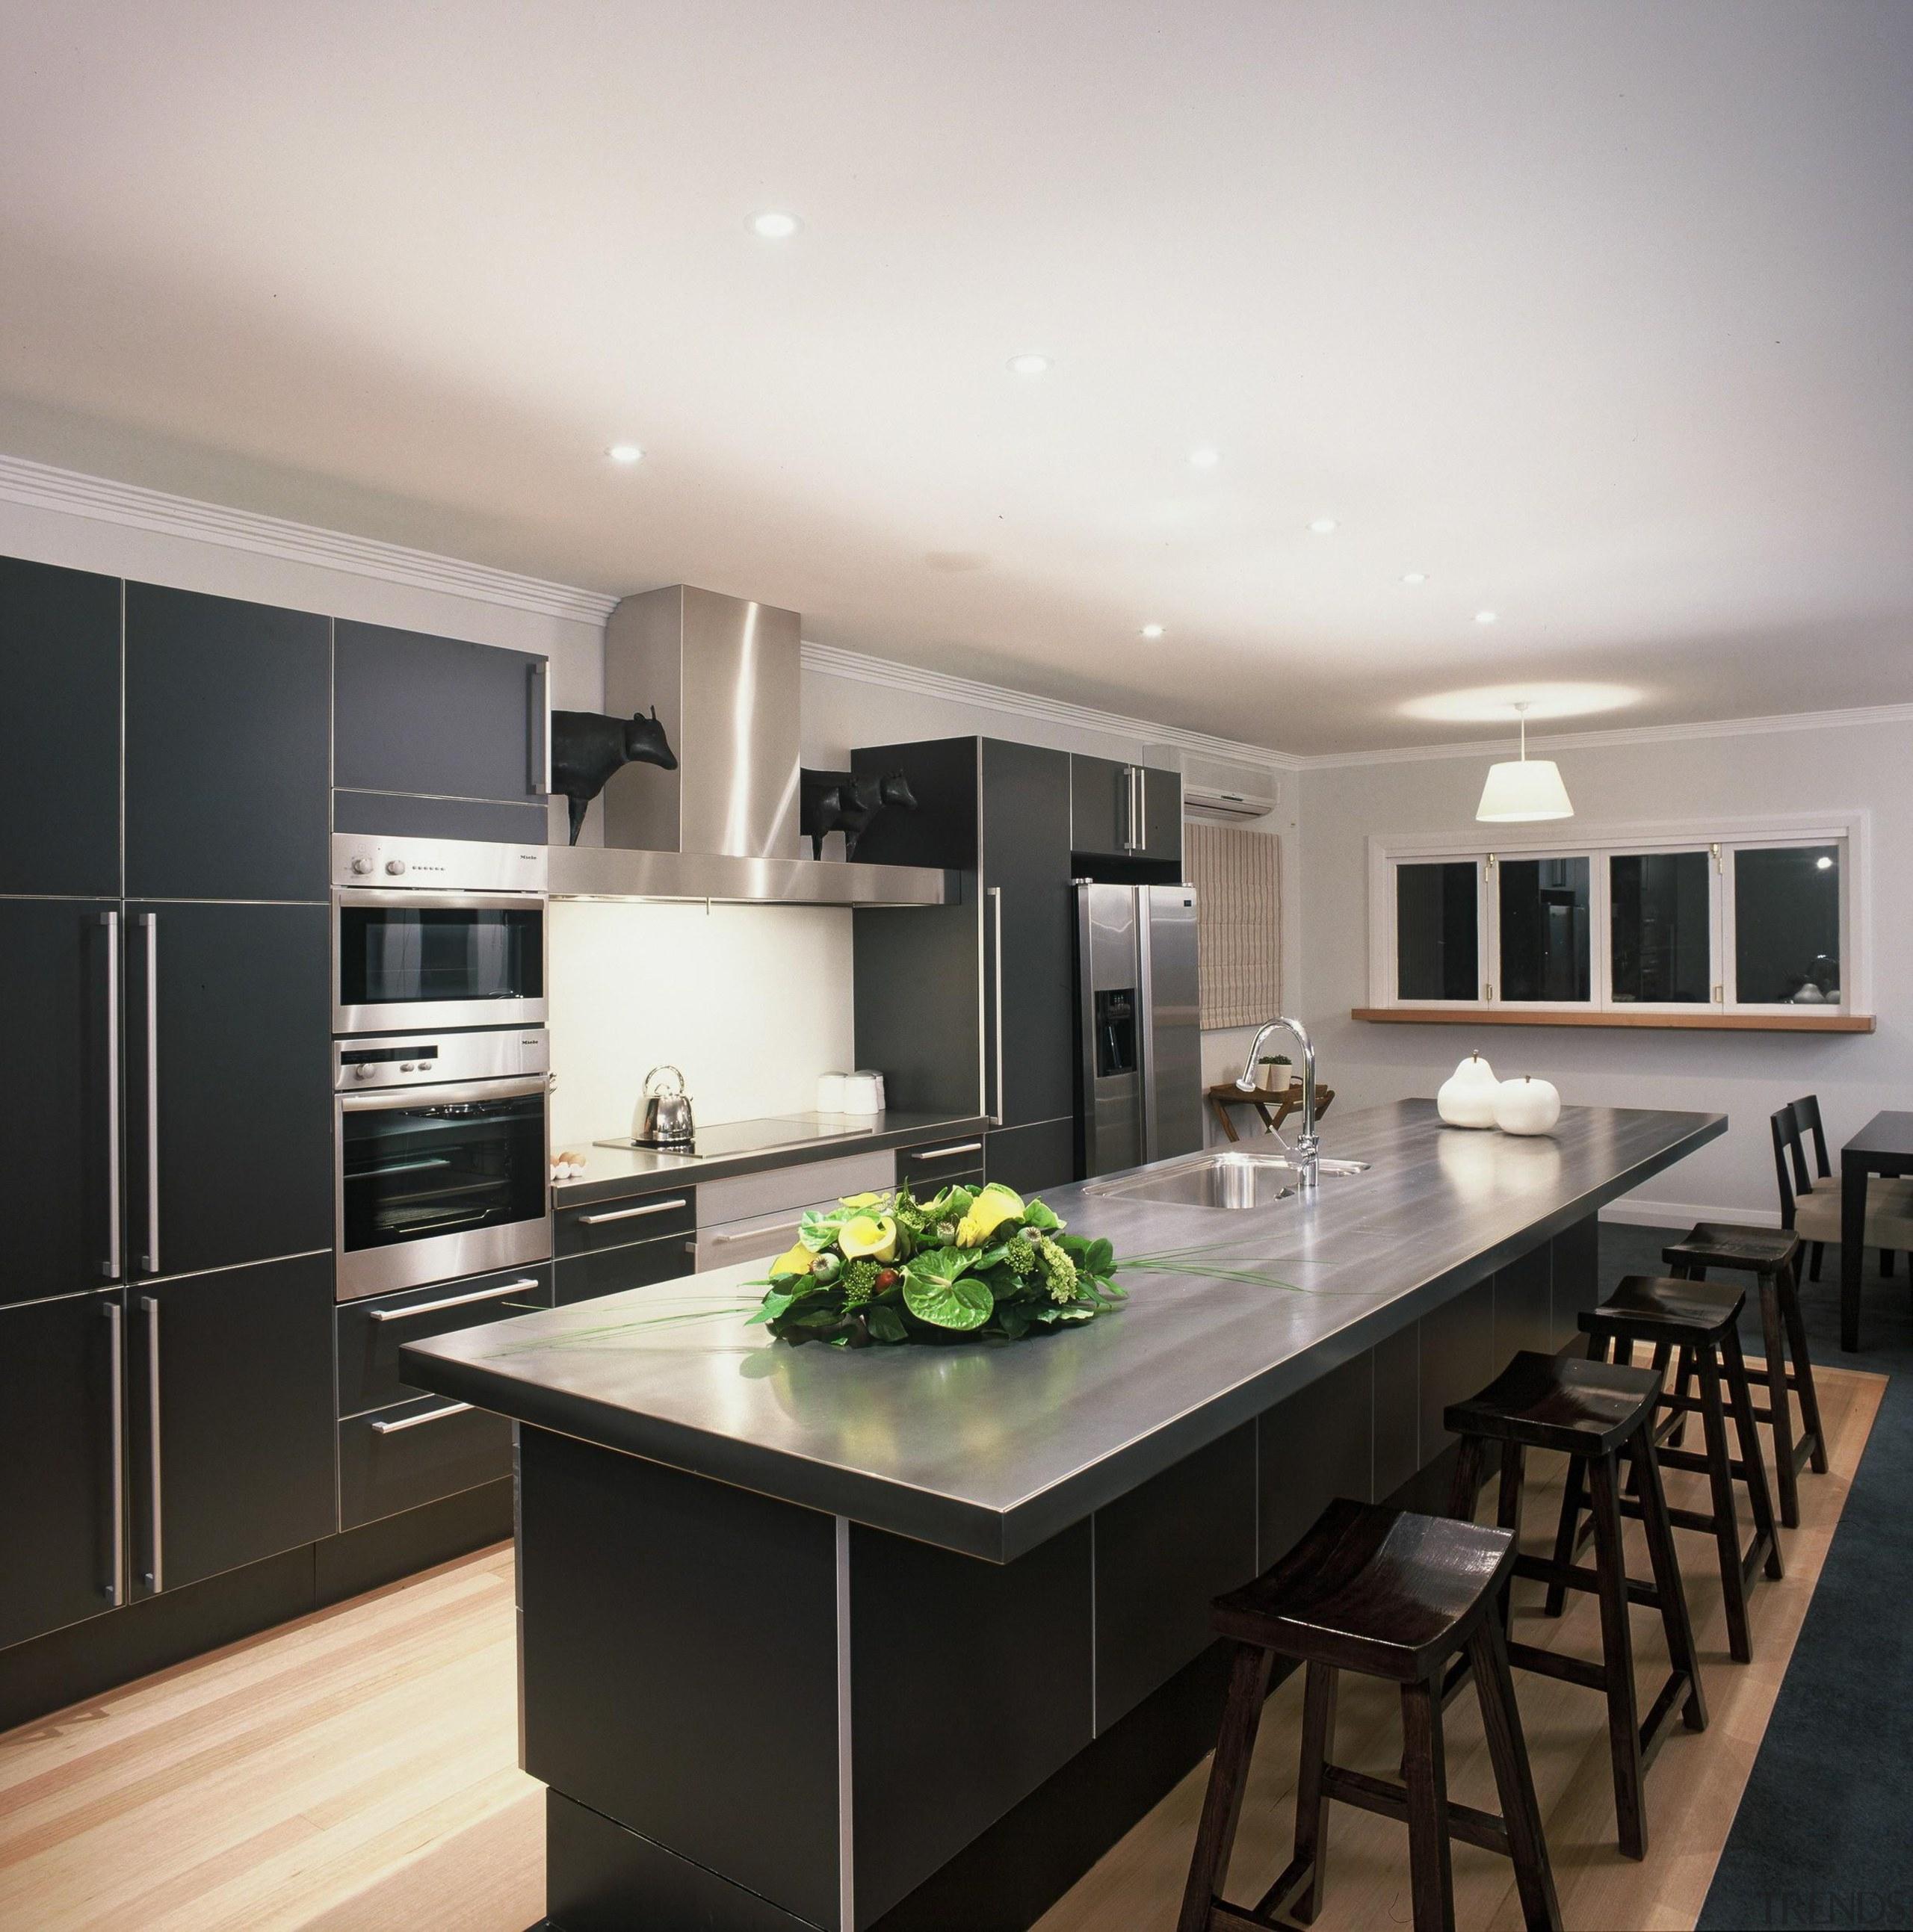 Woburn Kitchen - Woburn Kitchen - cabinetry | cabinetry, countertop, cuisine classique, interior design, kitchen, gray, black